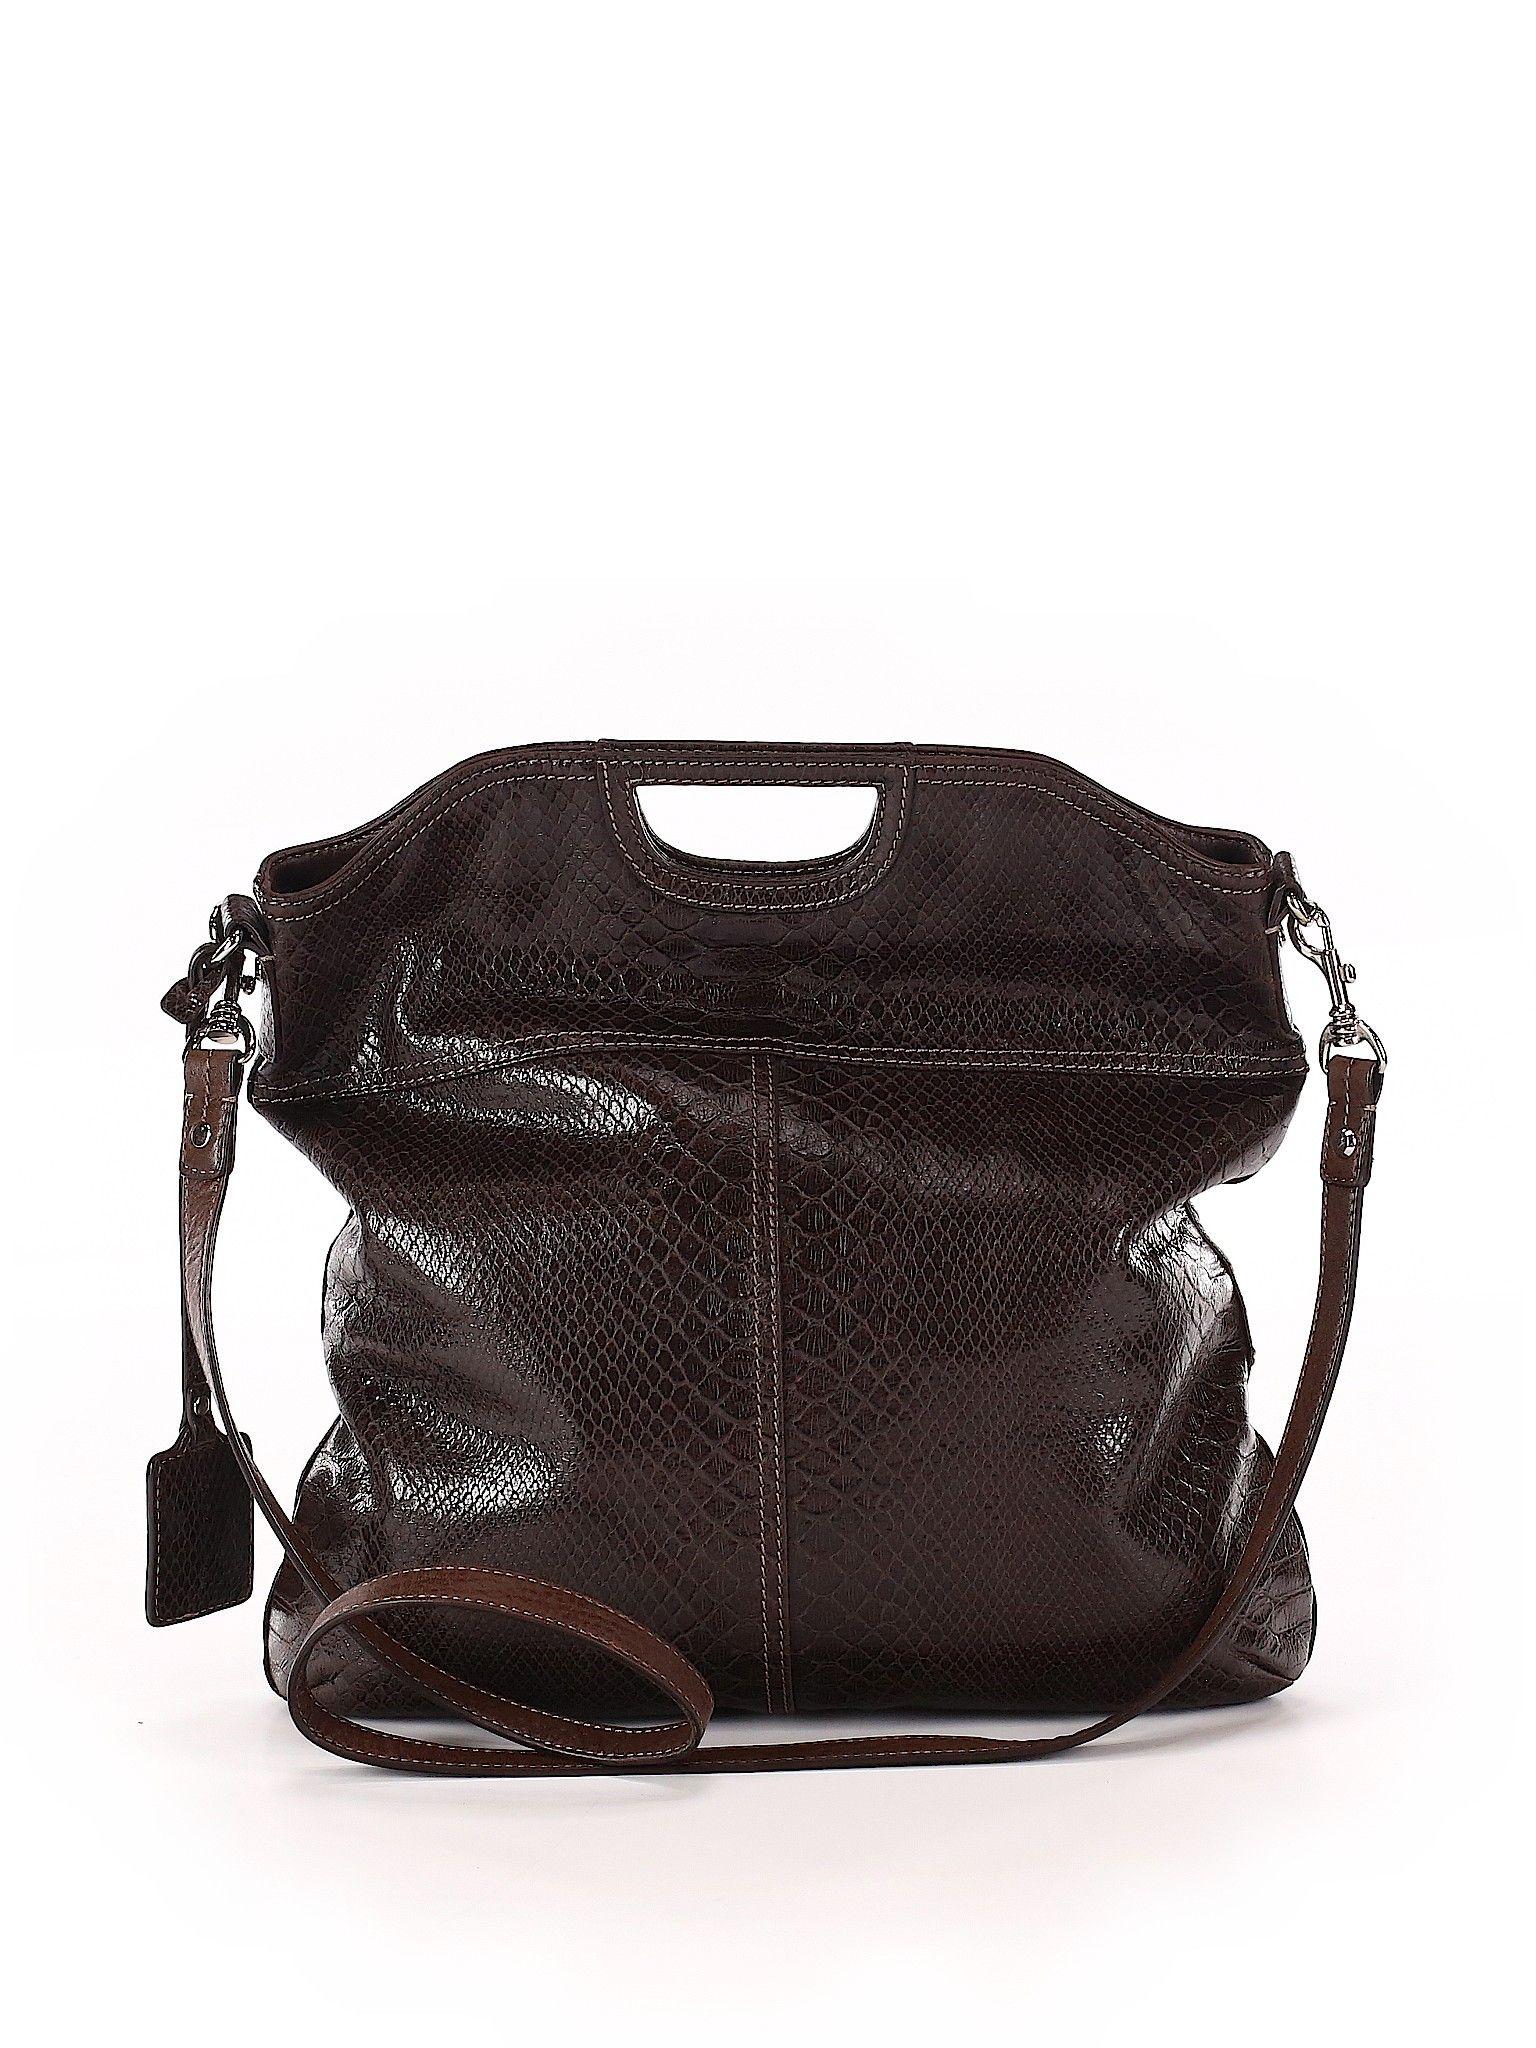 Leather Satchel Leather satchel, Brown leather satchel